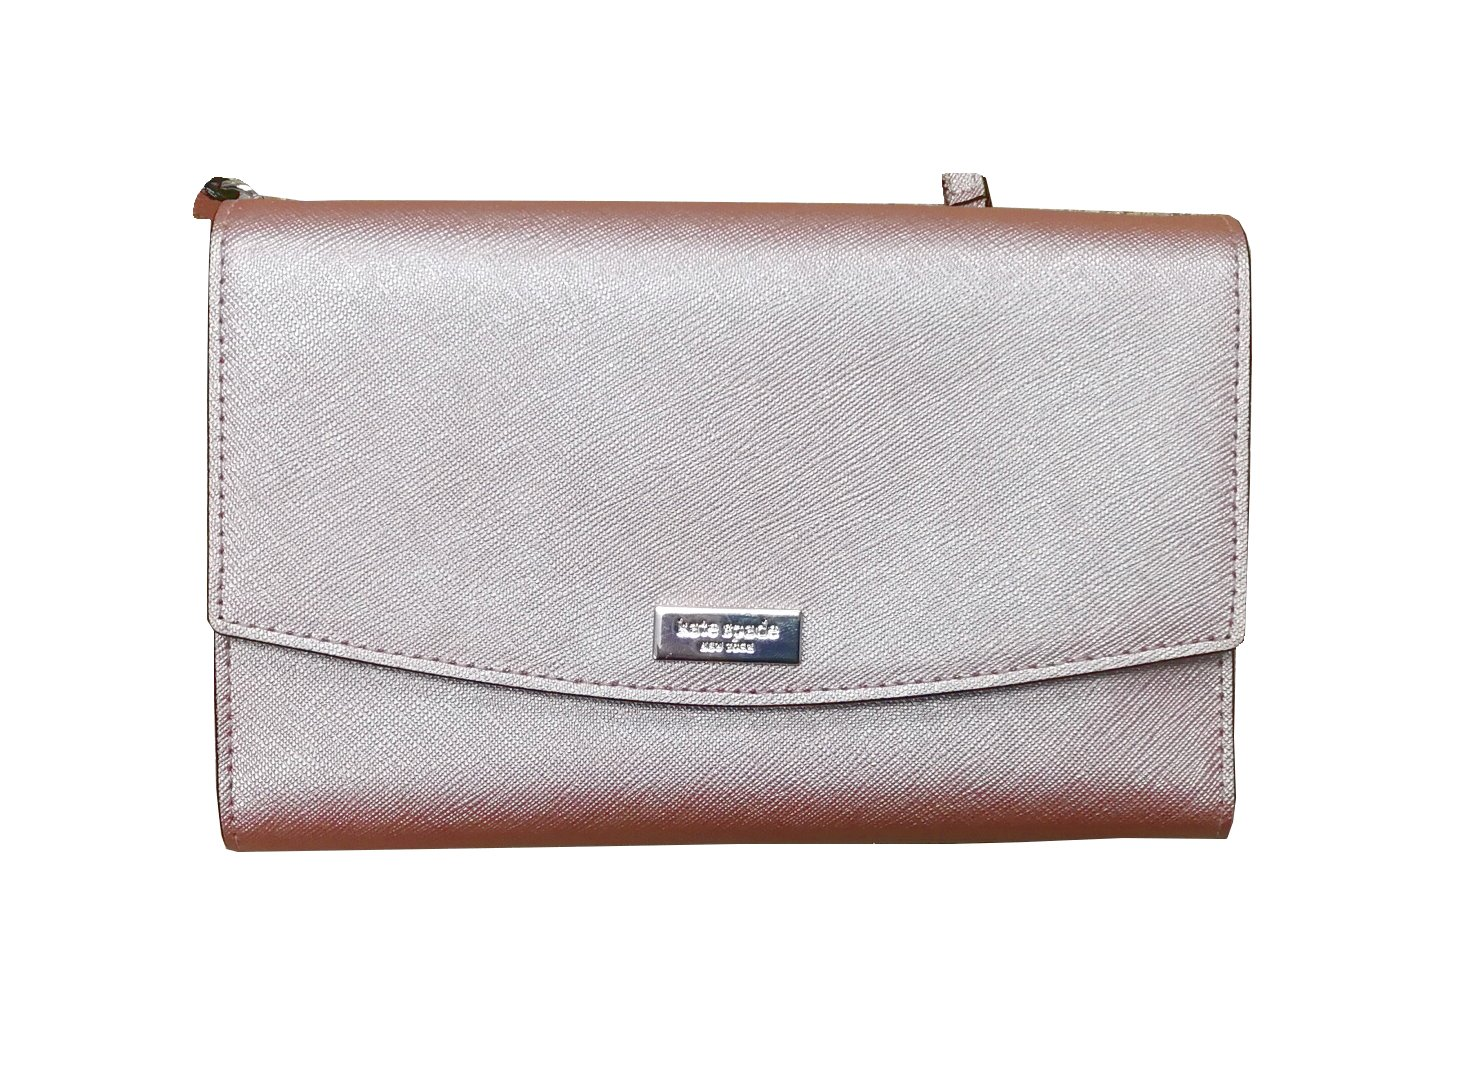 Kate Spade Laurel Way Winni Saffiano Leather Crossbody Clutch Wallet WLRU2667 Rose Gold